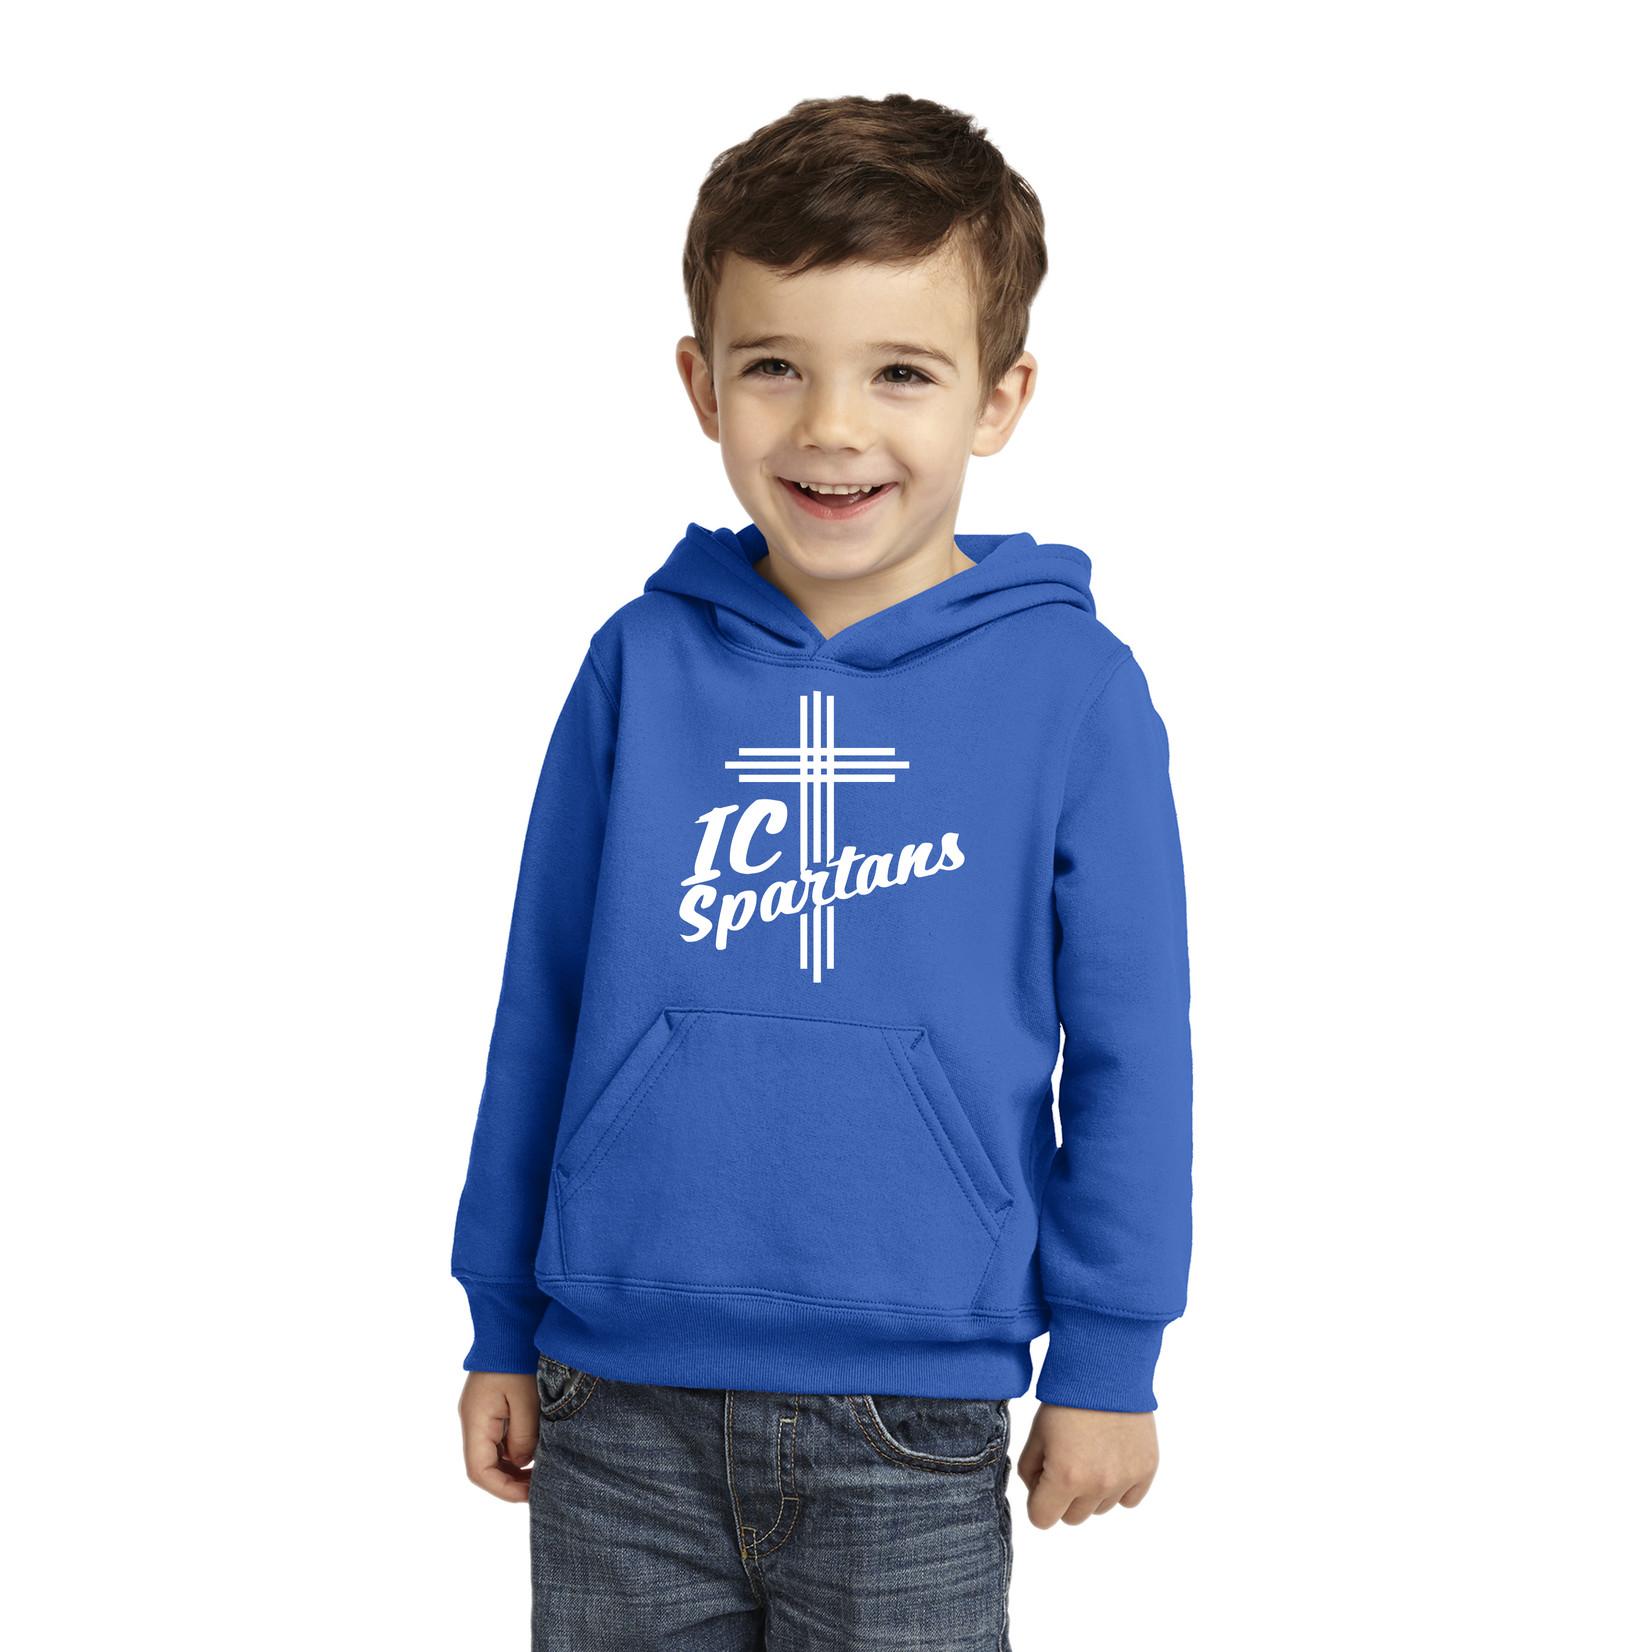 Port & Company TODDLER Hooded Sweatshirt Royal